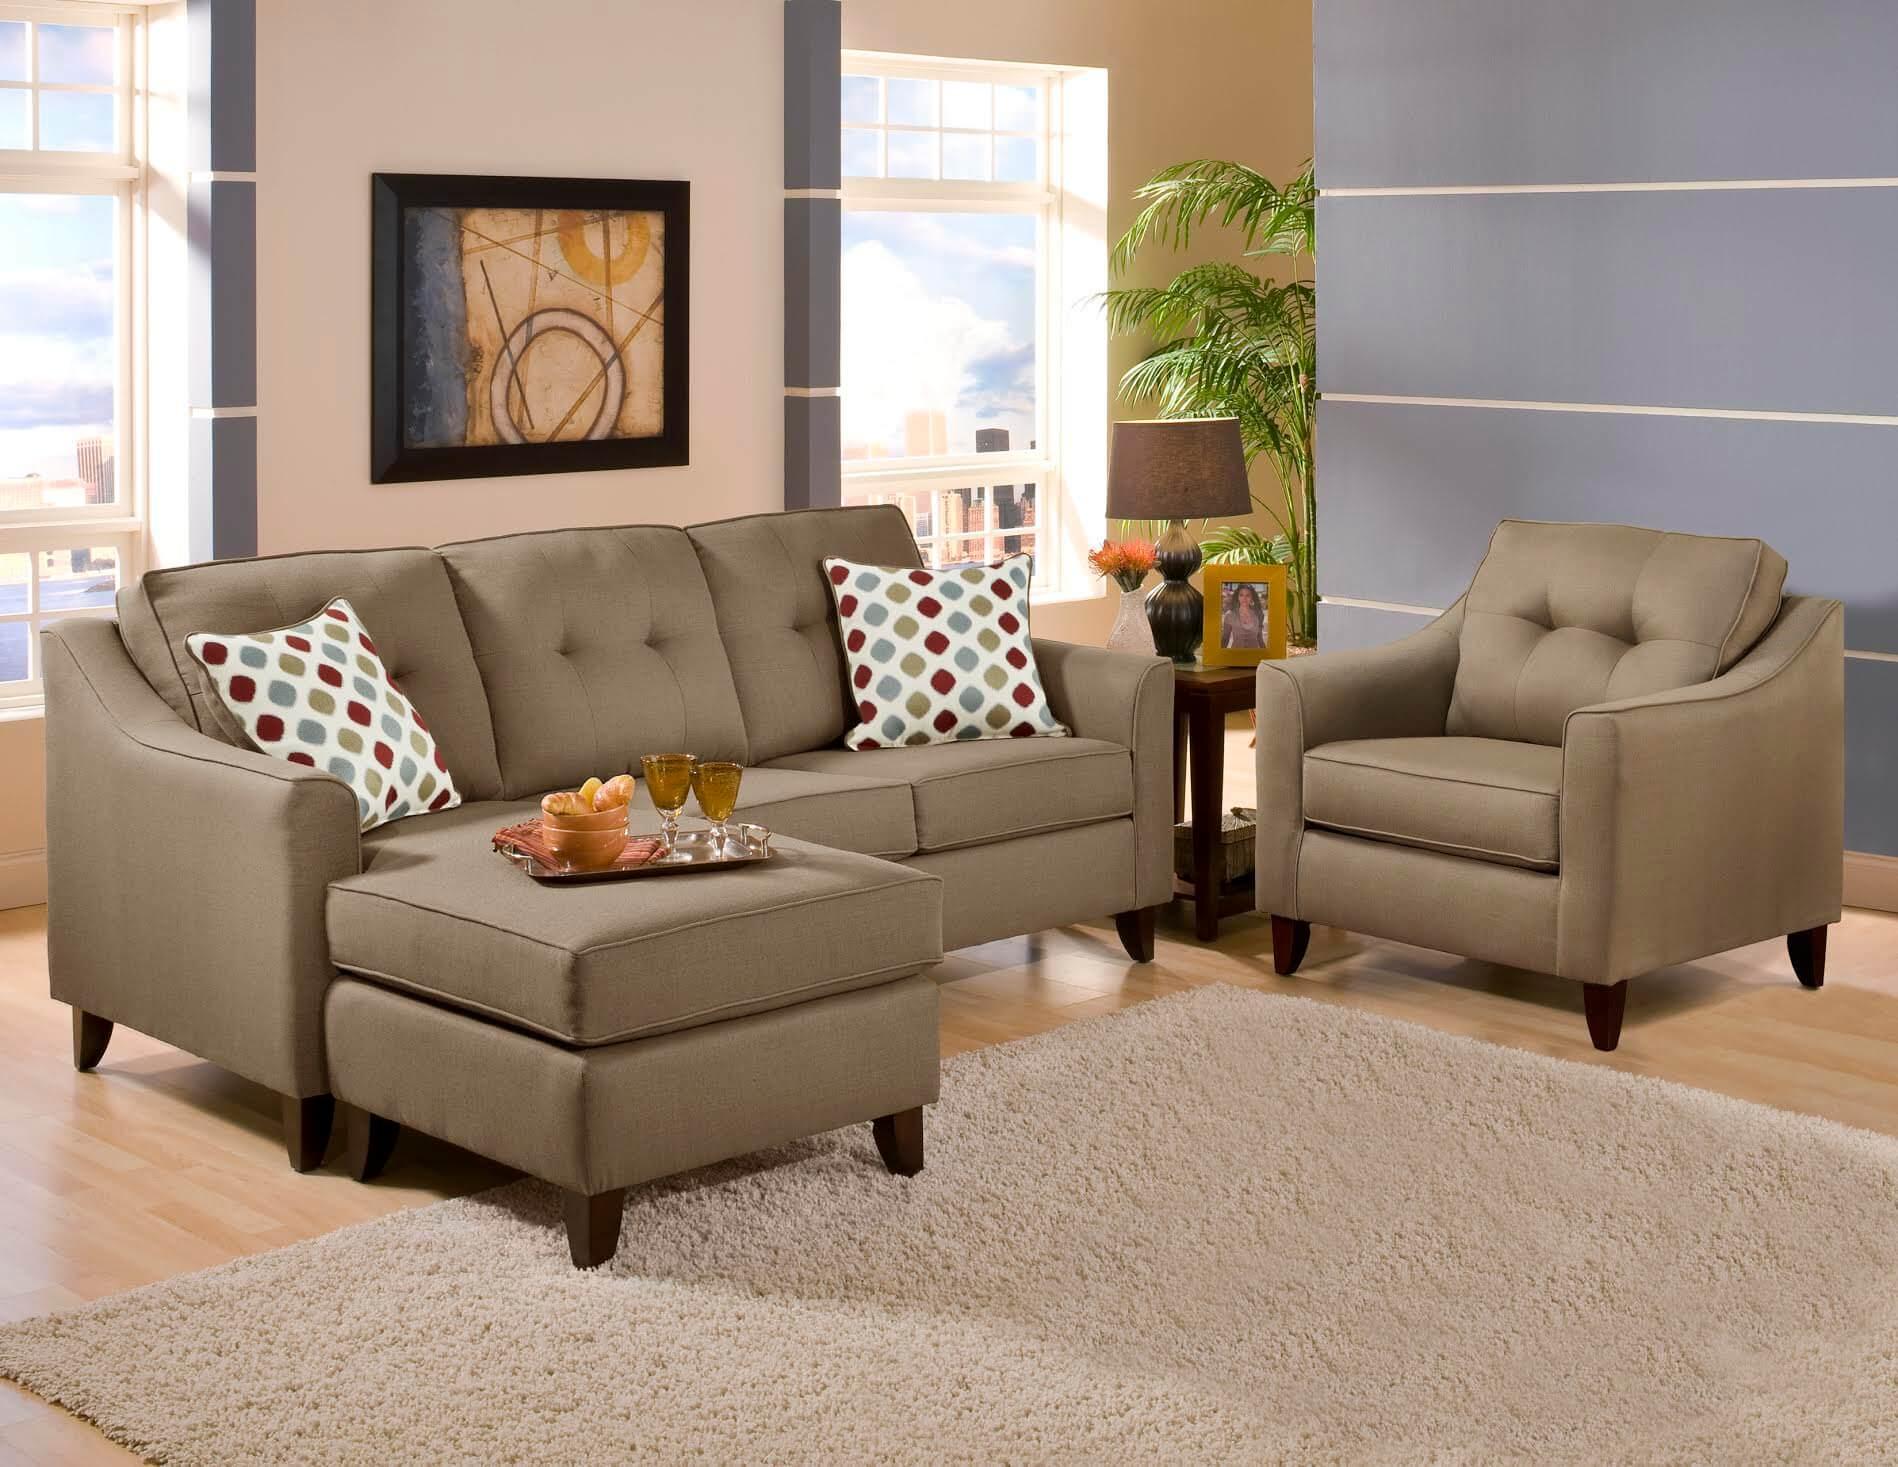 Stoked Truffle Sofa Chaise by Washington